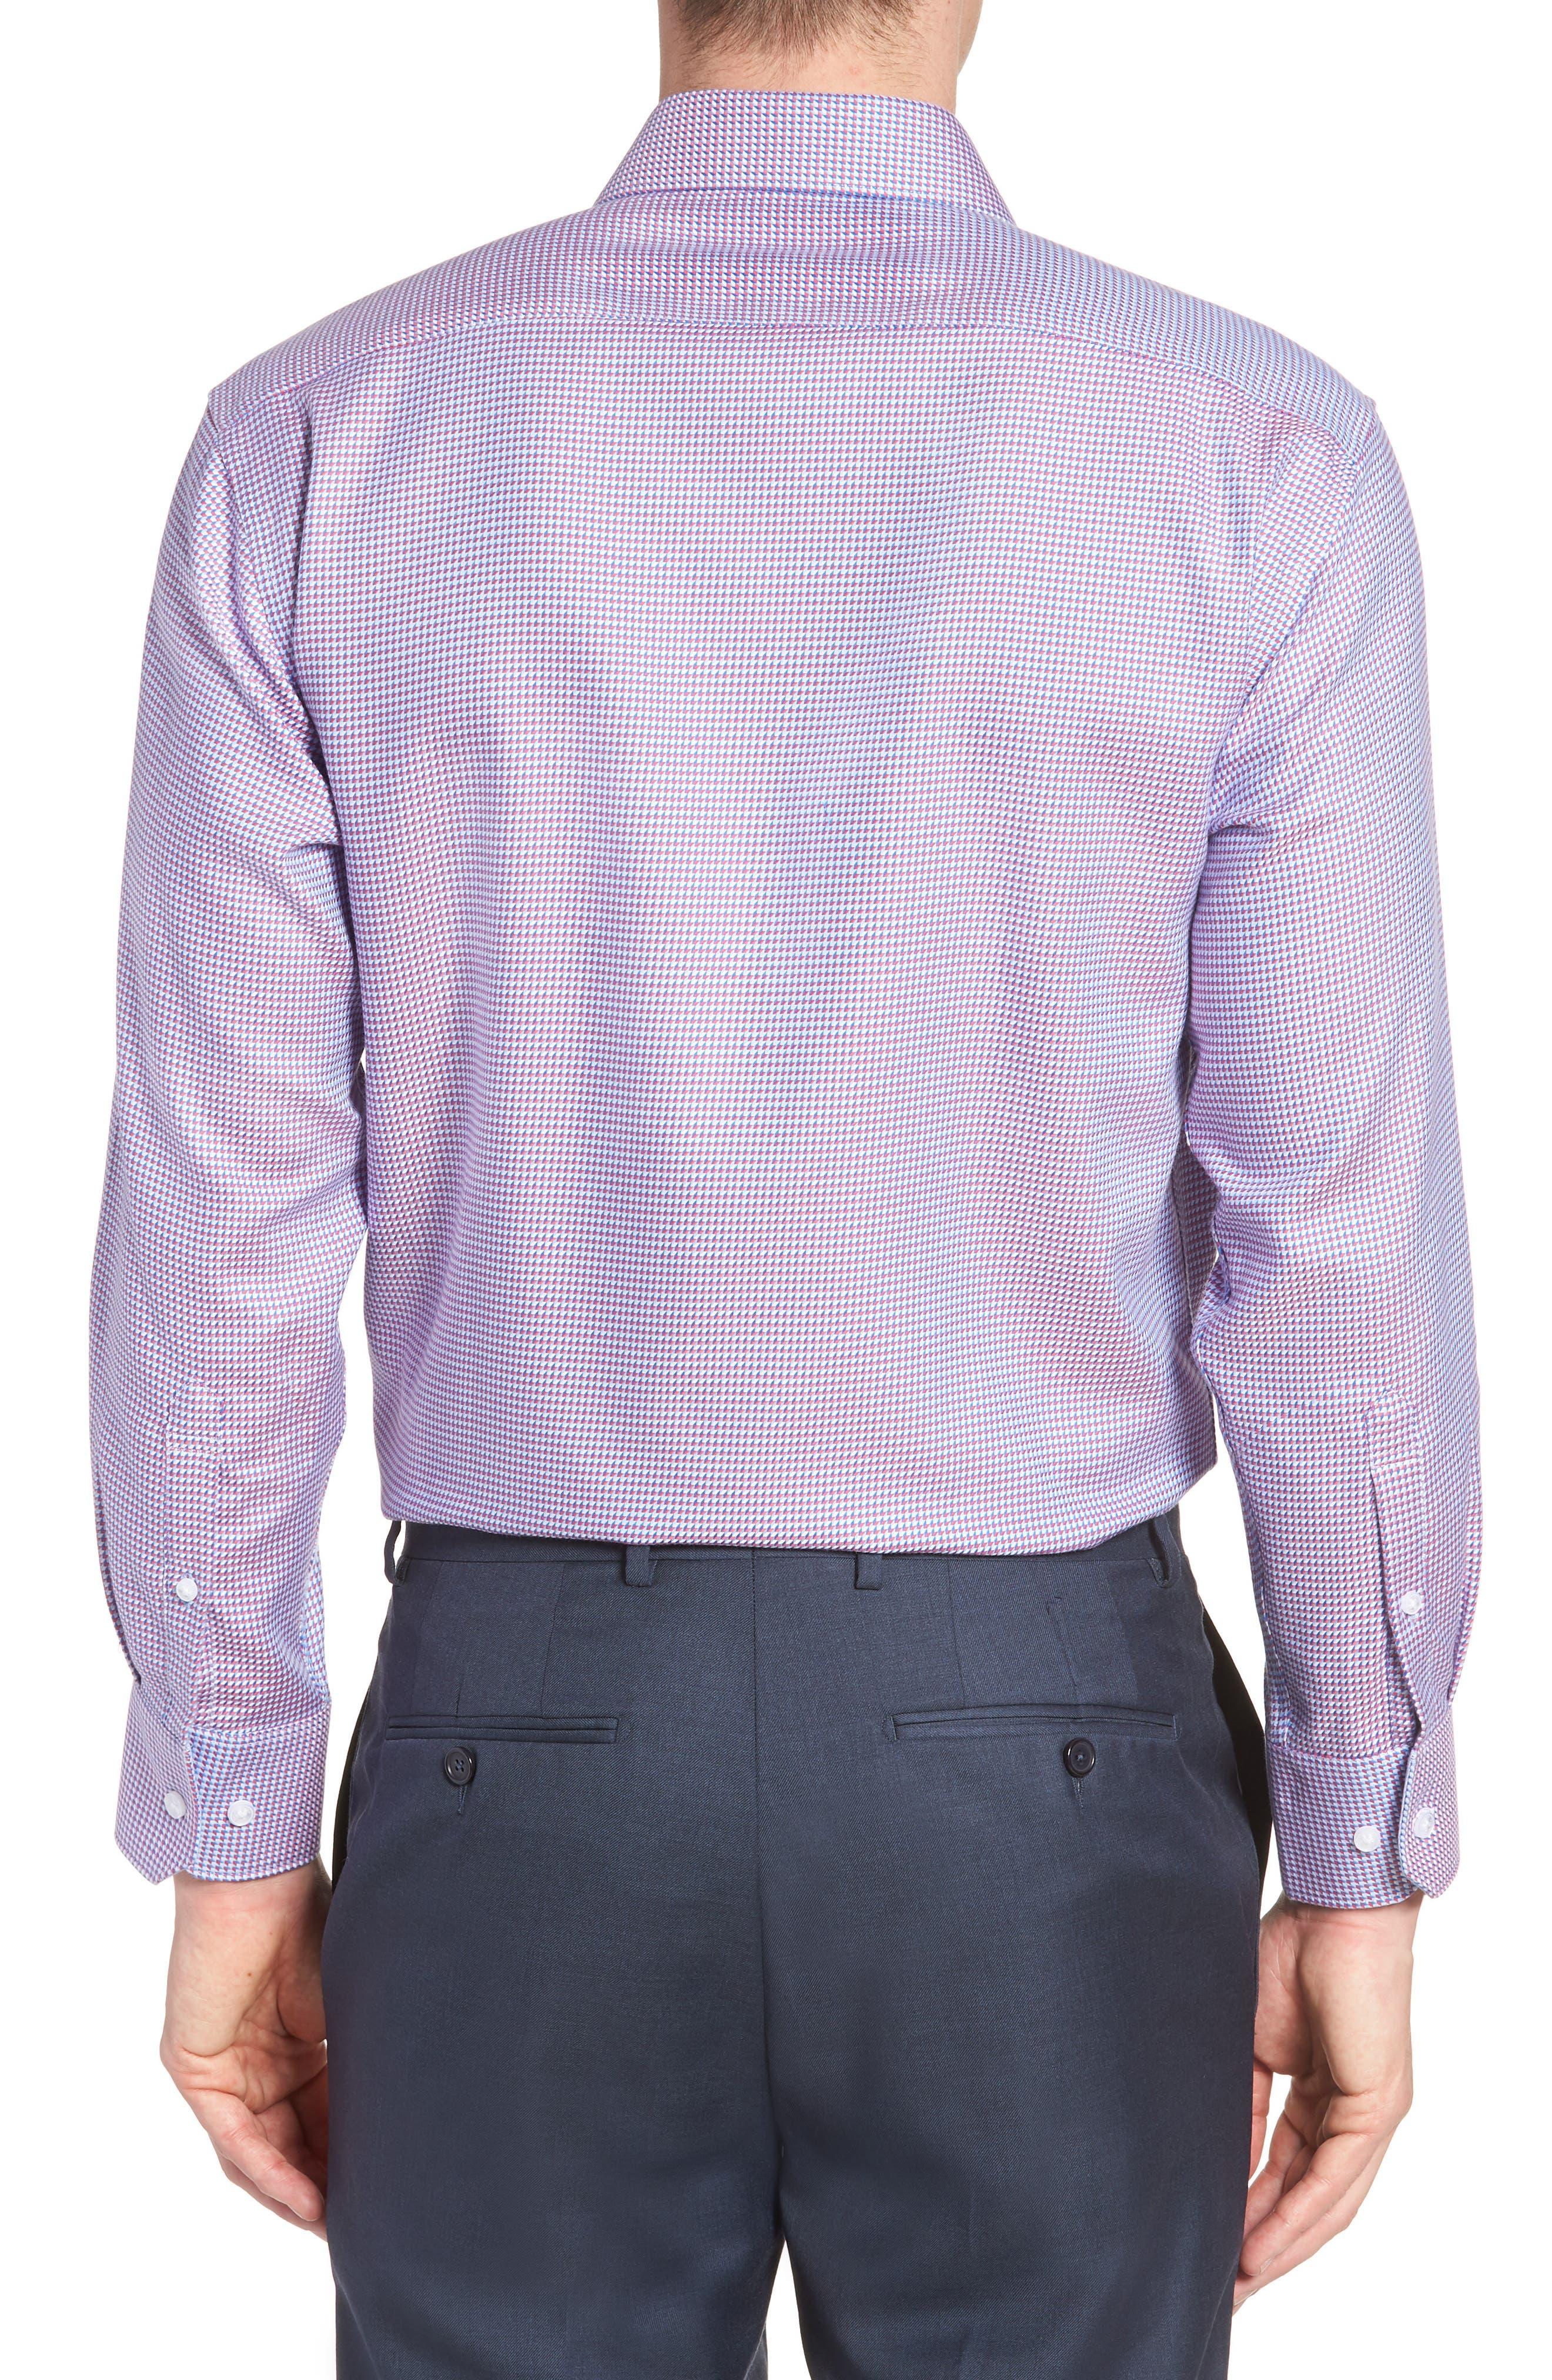 Axton Trim Fit Geometric Dress Shirt,                             Alternate thumbnail 3, color,                             400